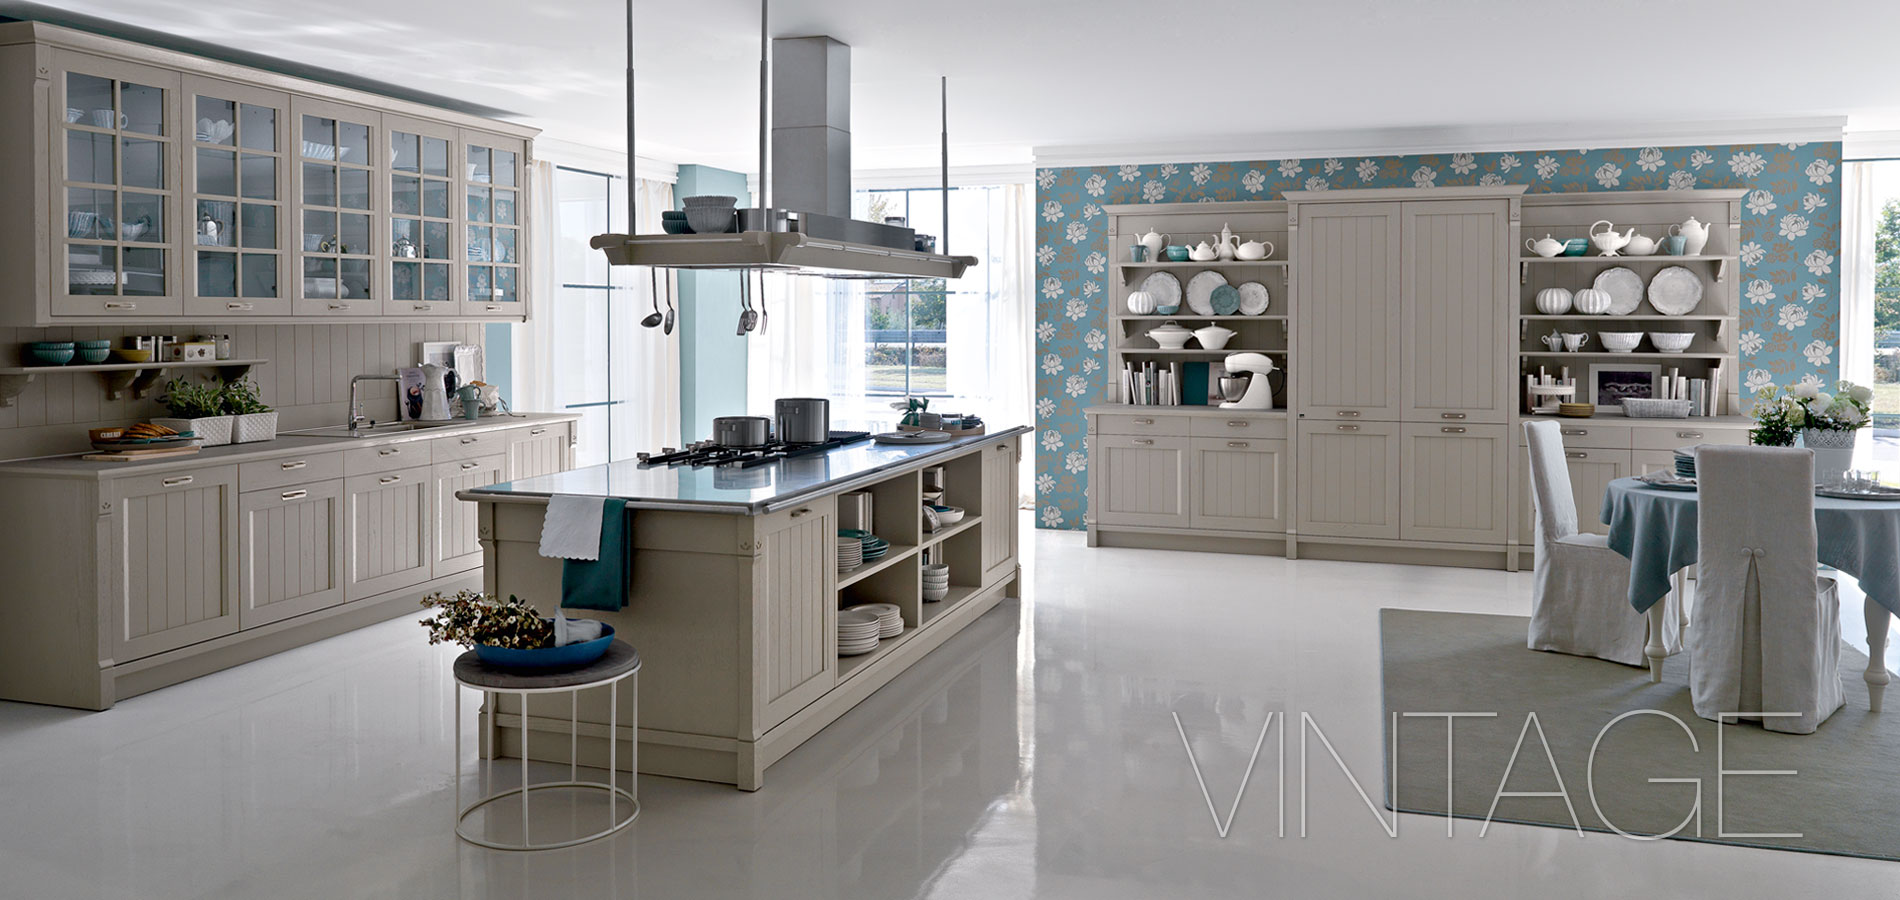 cucina vintage pedini pellegrino arreda cucine. Black Bedroom Furniture Sets. Home Design Ideas